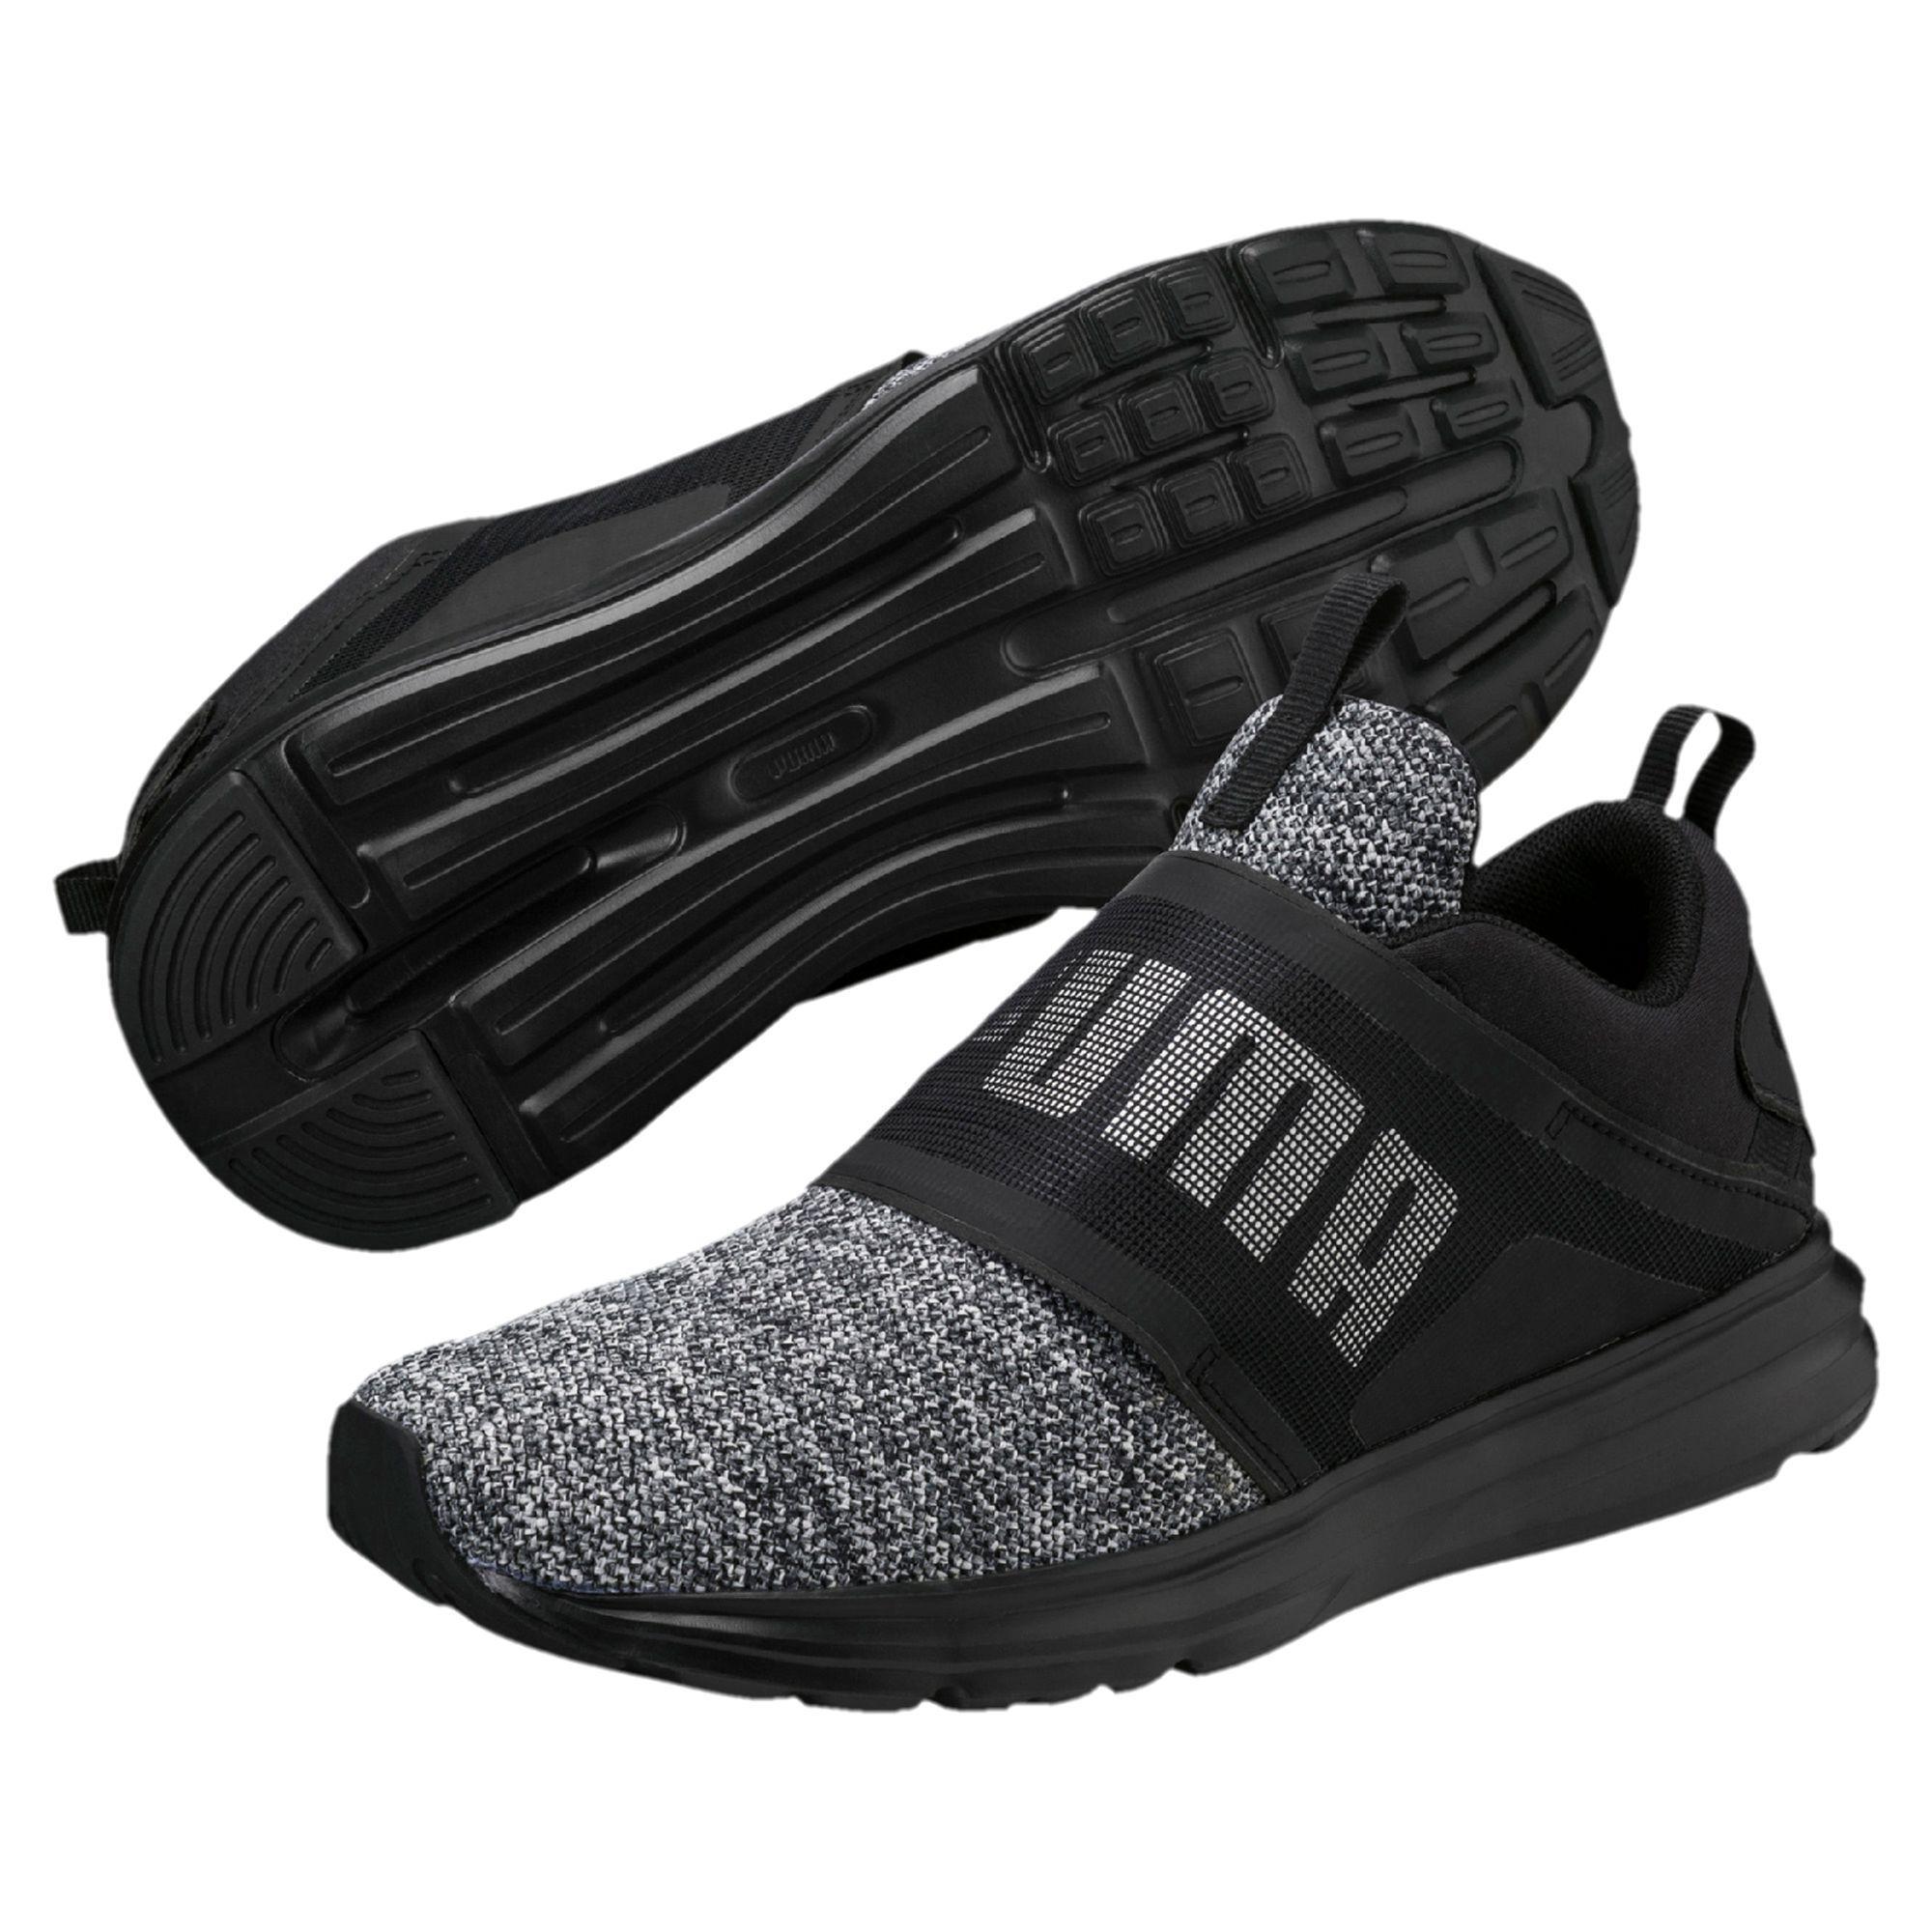 46c7cd82af3b Lyst - Puma Enzo Strap Knit Women s Running Shoes in Black for Men